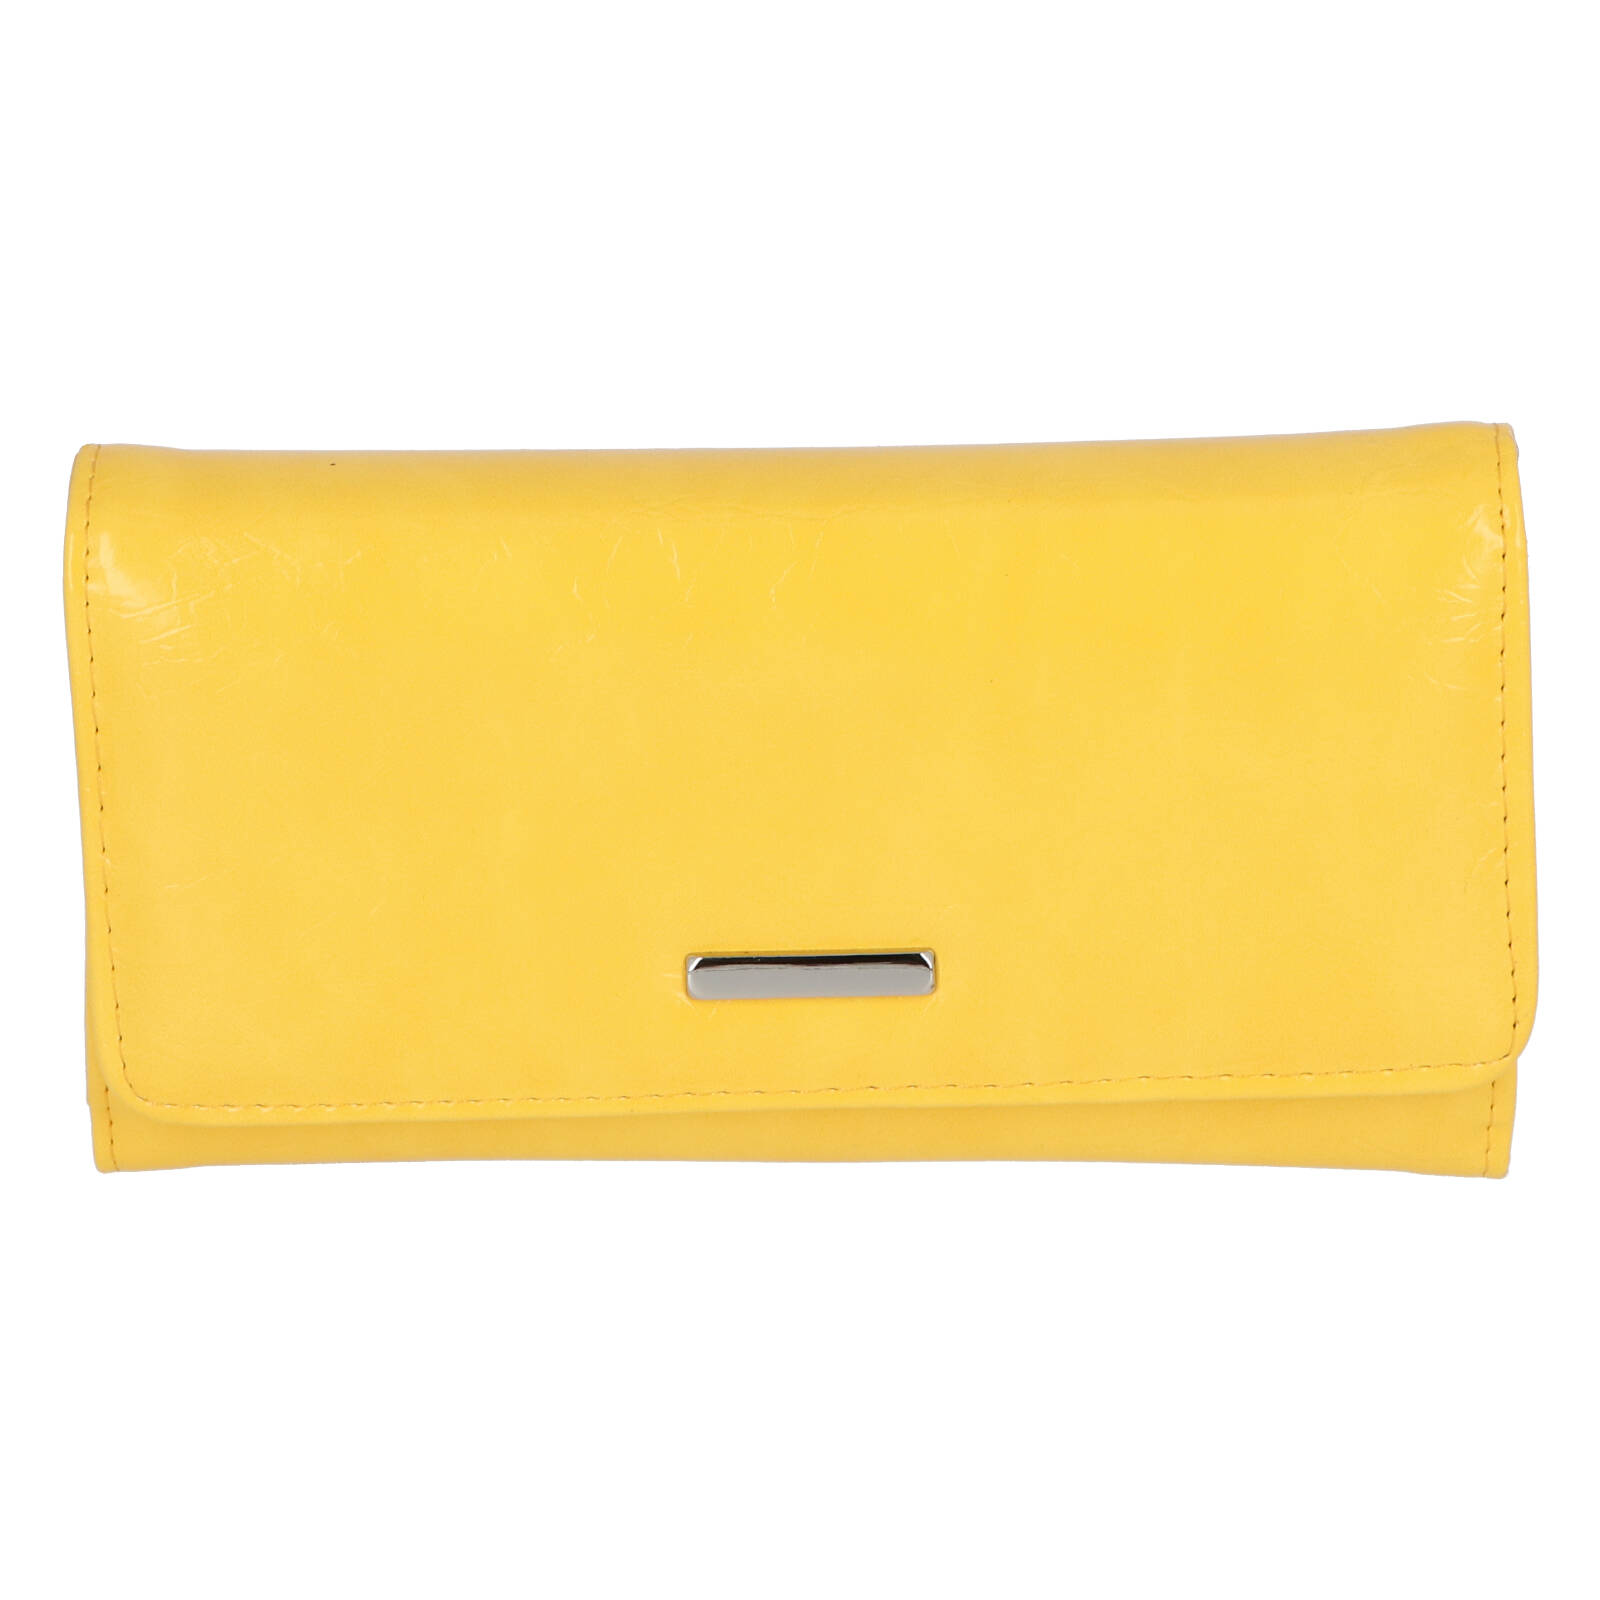 Dámska listová kabelka do ruky žltá - Michelle Moon F290